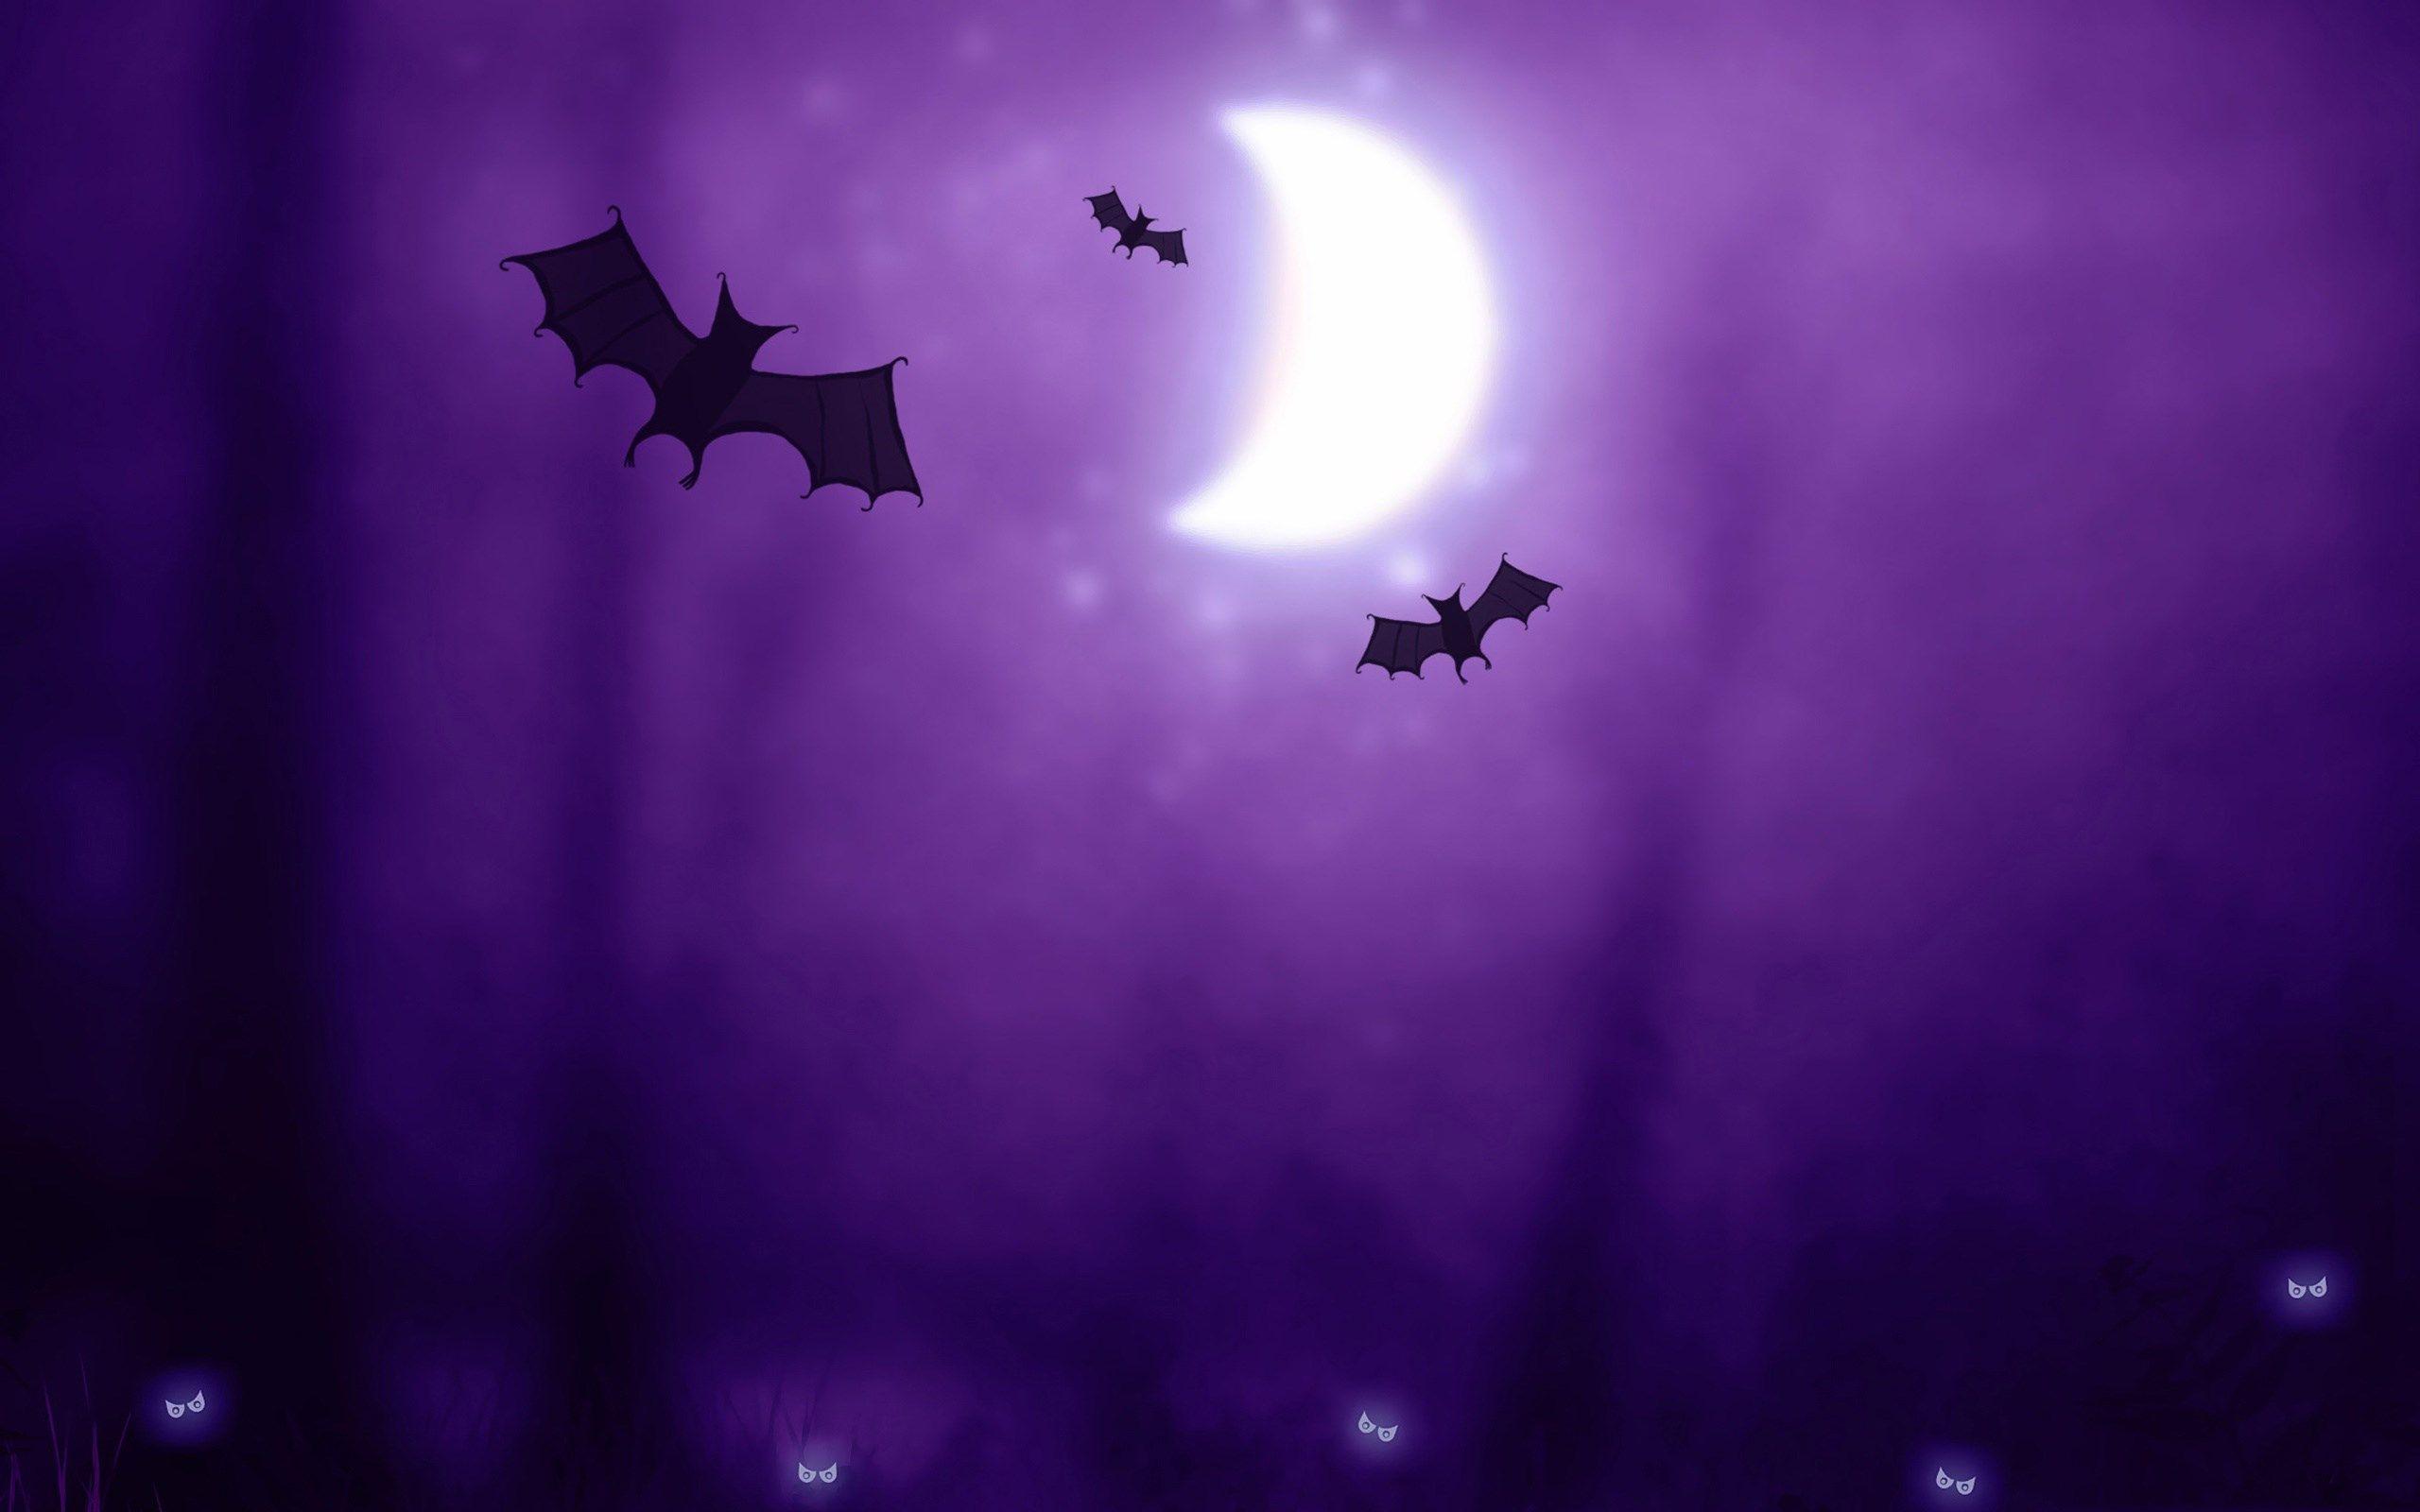 Amazing Wallpaper Mac Halloween - 8acffd41233d66403bf4cee75d8c6b65  Pictures_432522.jpg